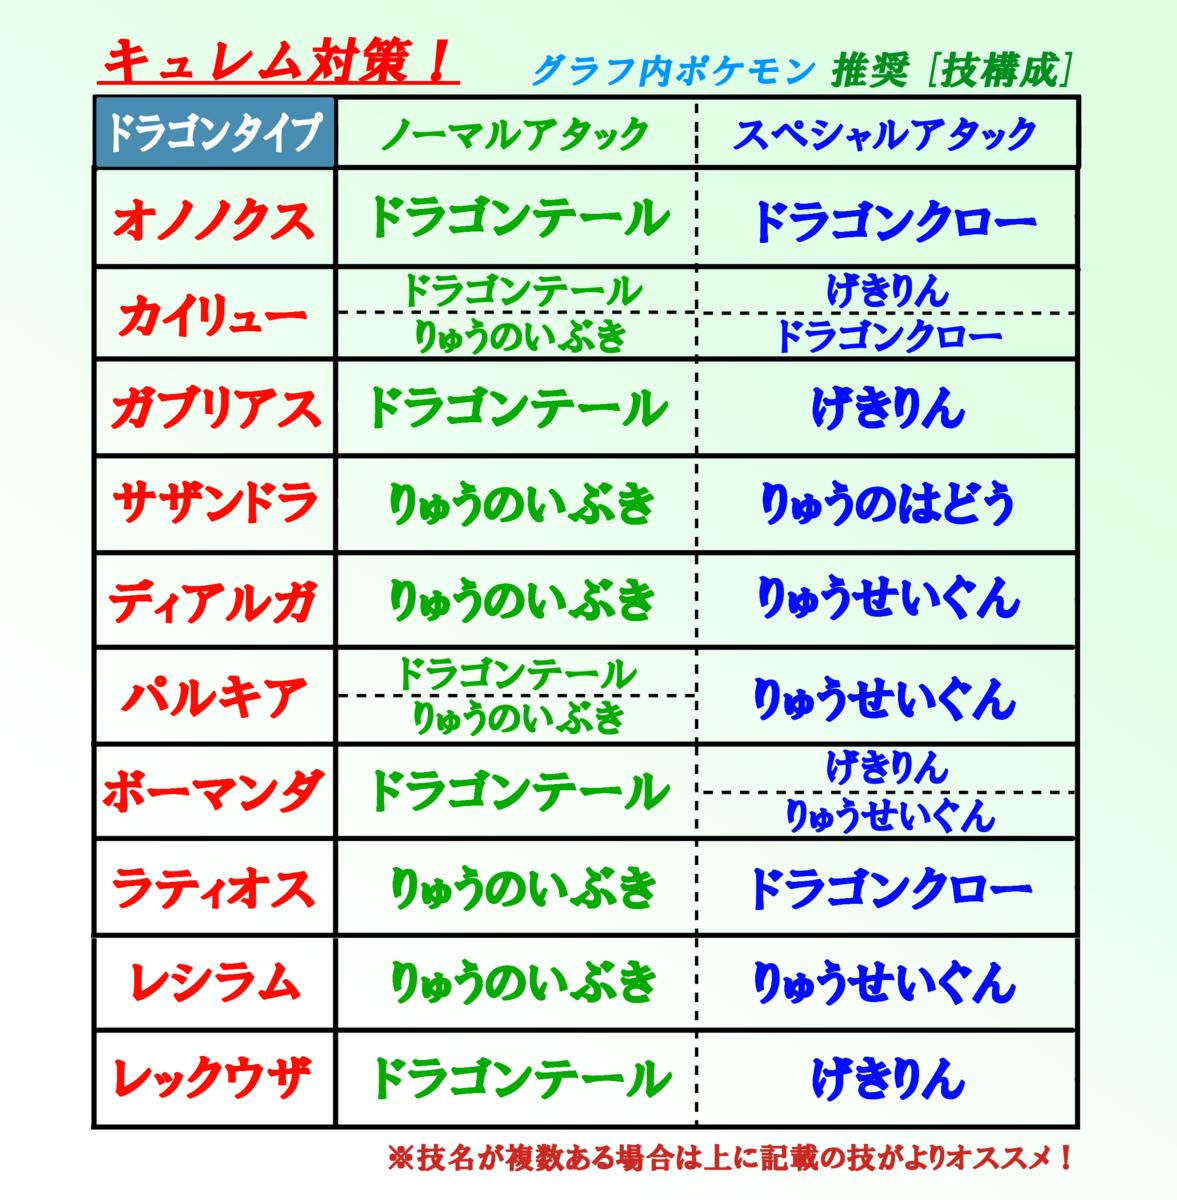 f:id:Kazumin0331:20200703003803p:plain